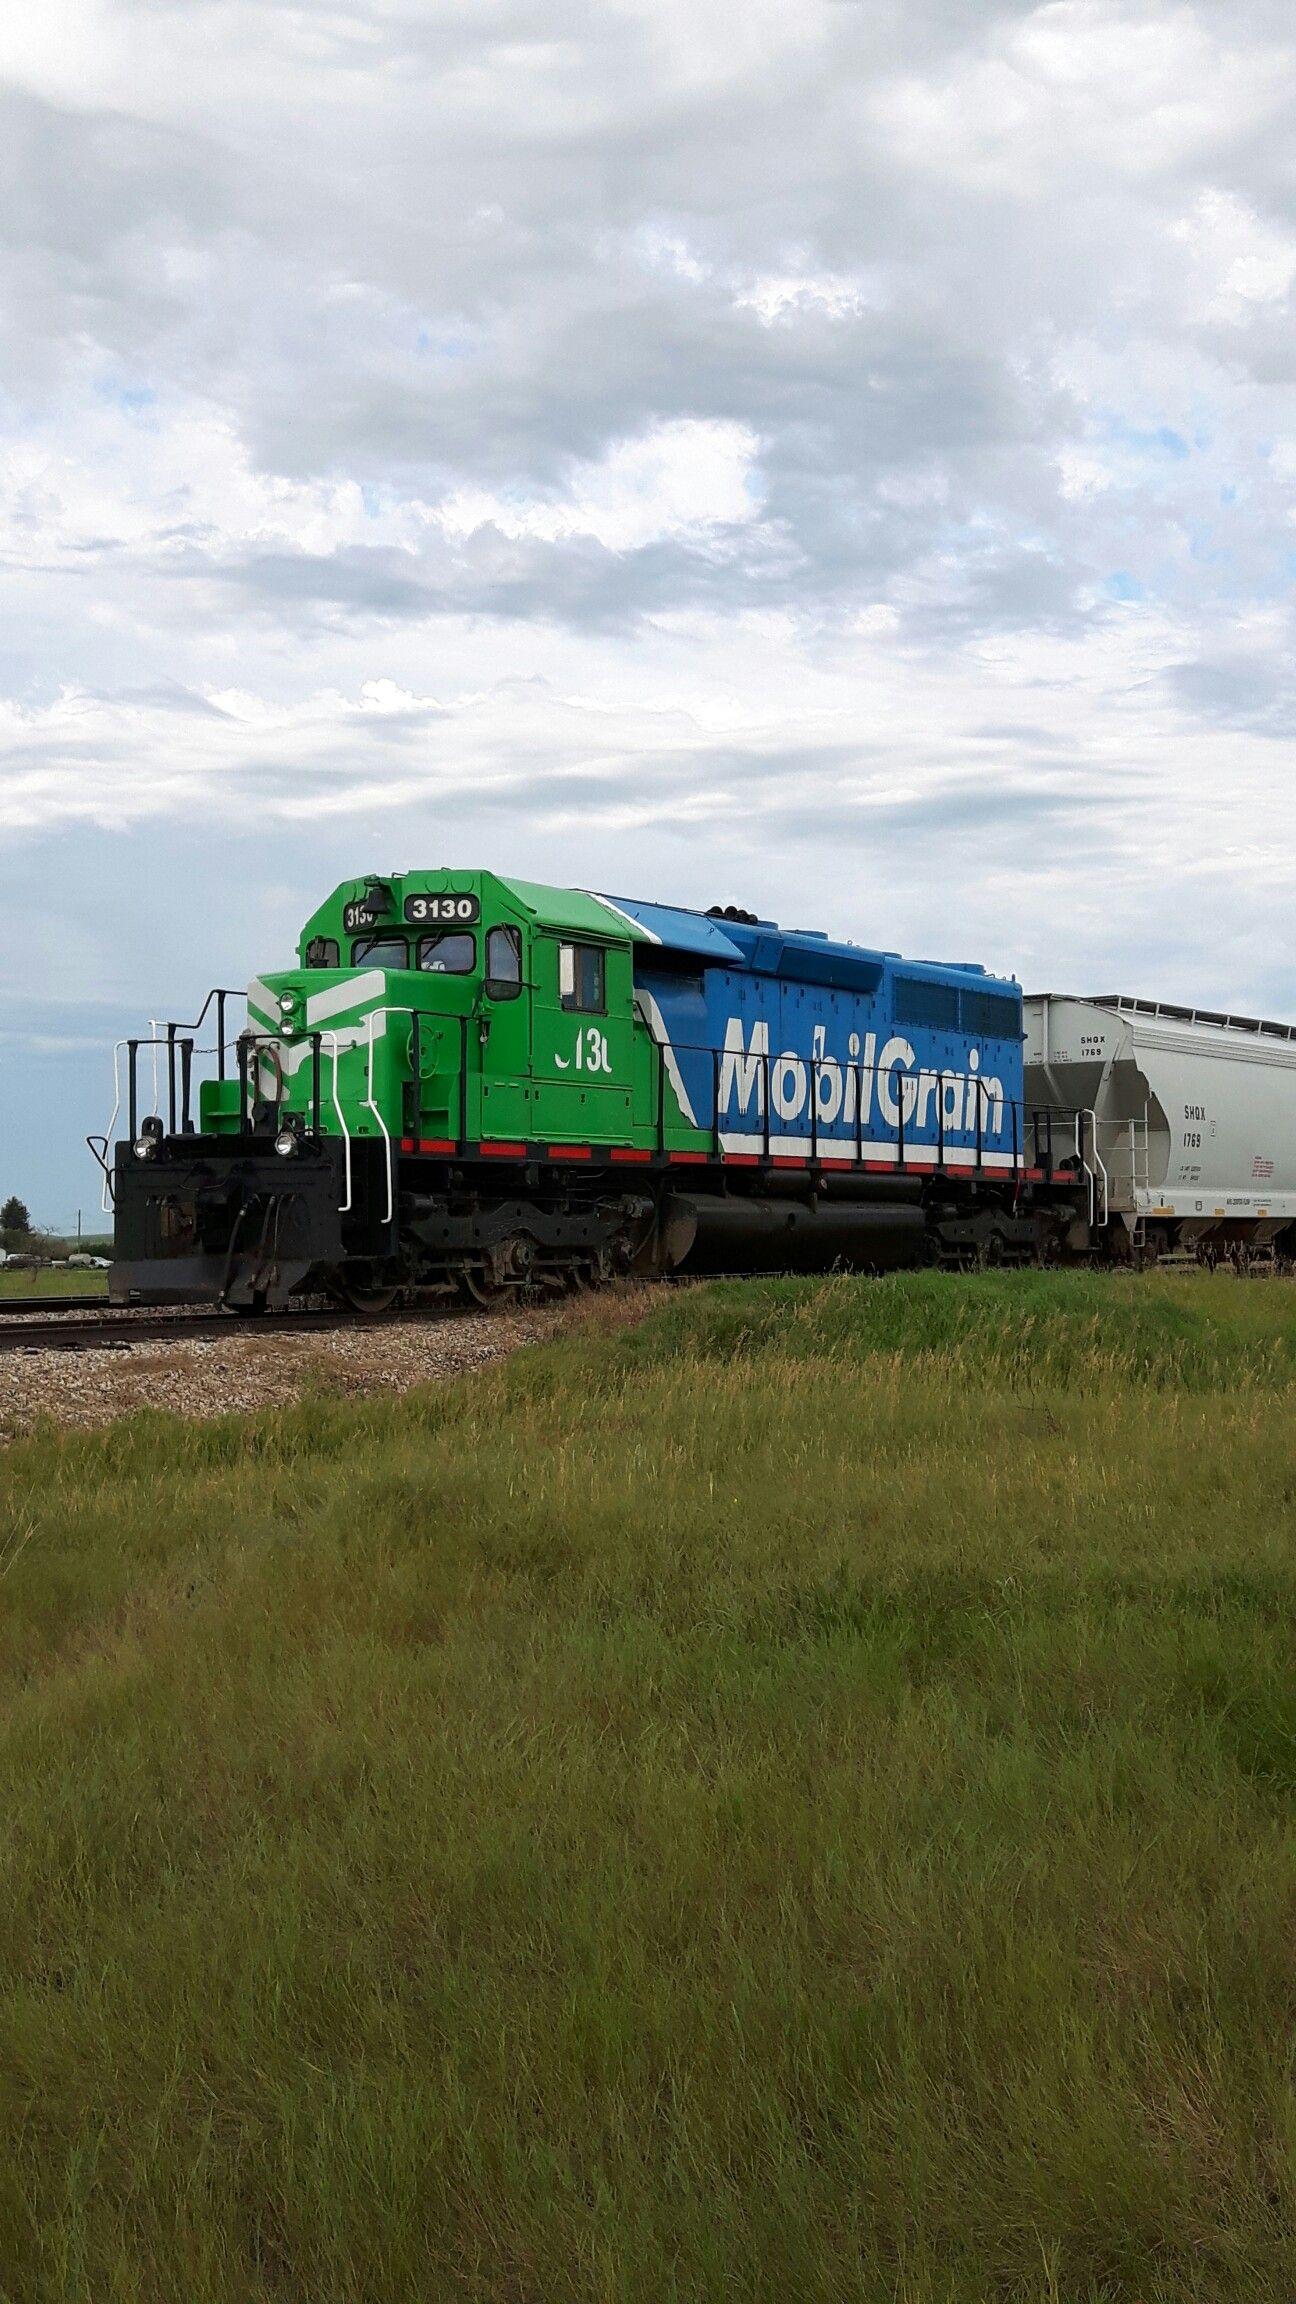 Mobil Grain. Madison Saskatchewan